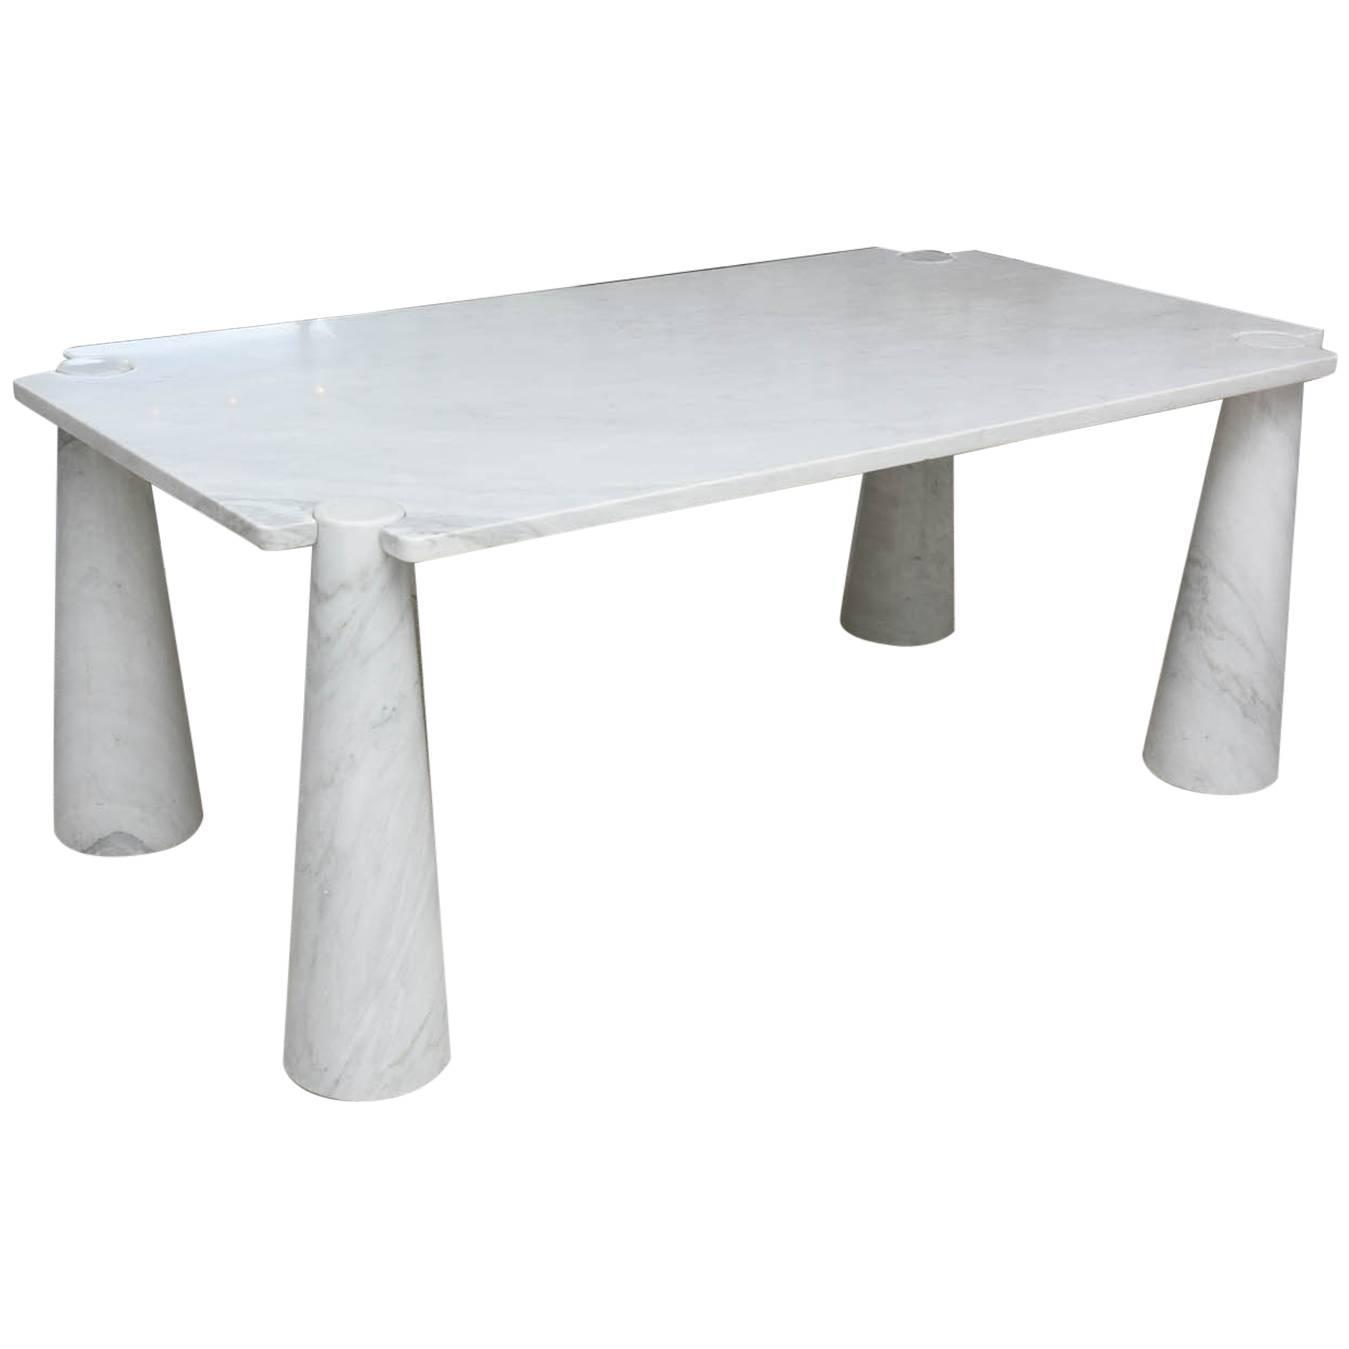 Italian modern carrera marble eros center dining table for Table carrera